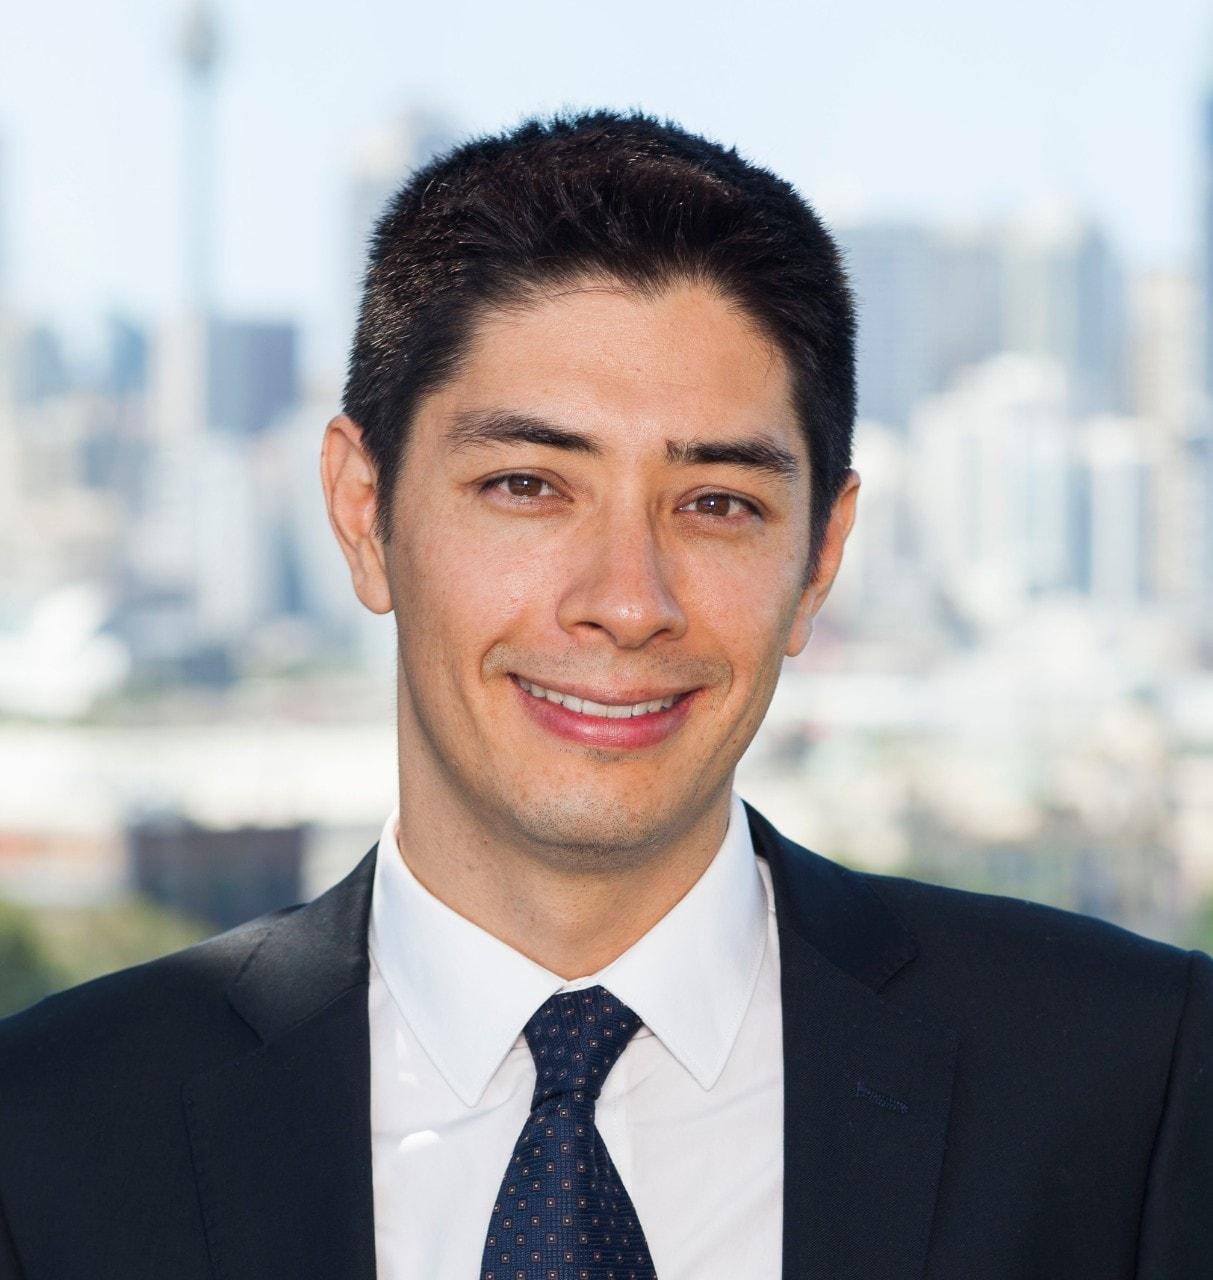 Senior leadership team - The University of Sydney